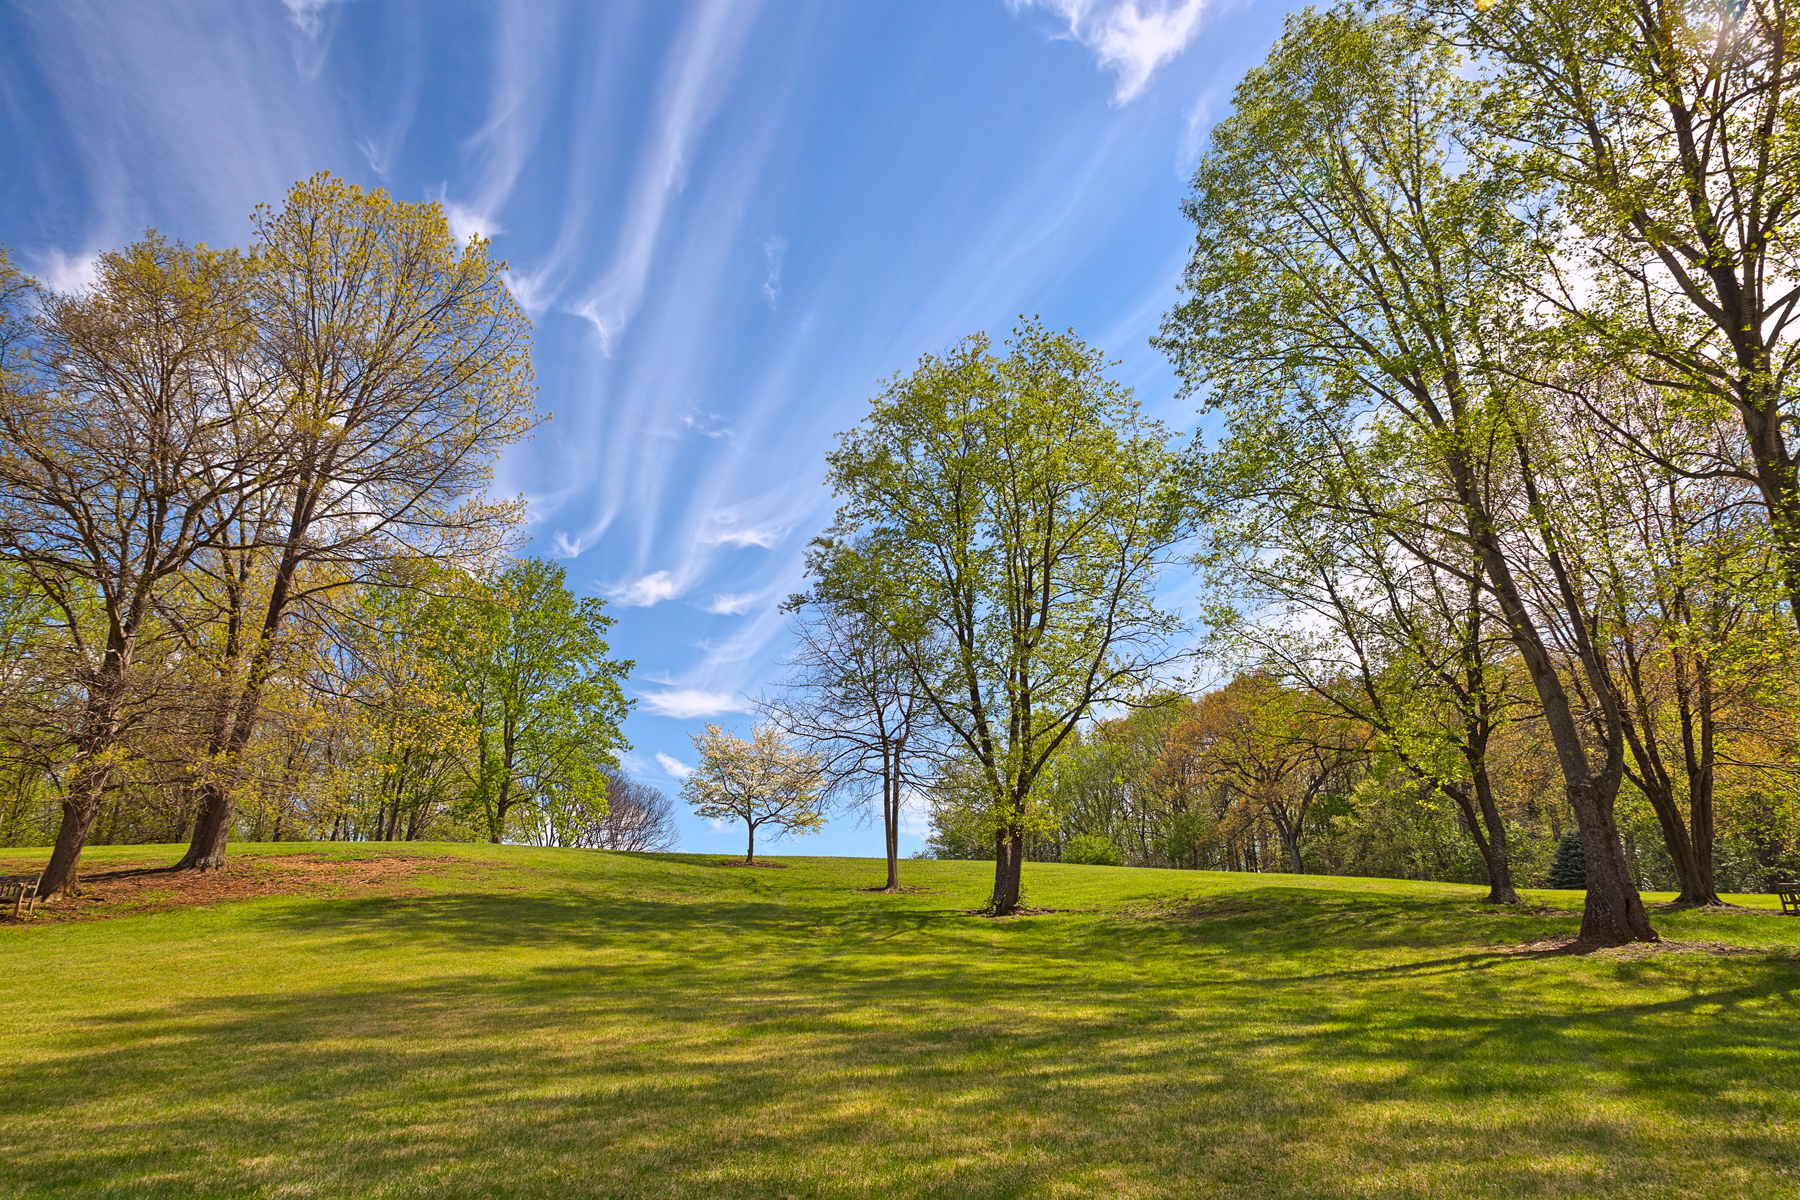 Meadowlark gardens - hdr photo